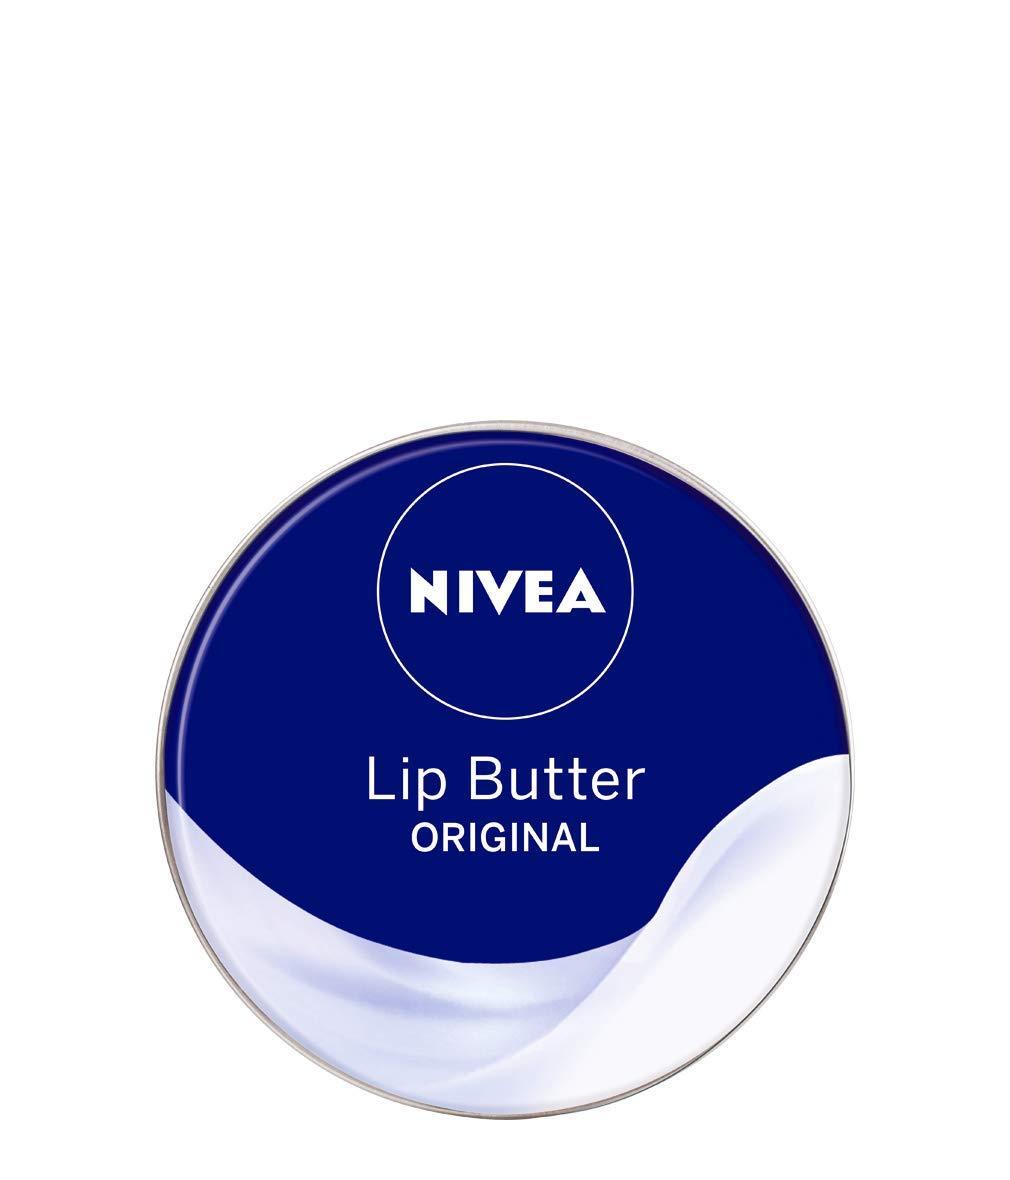 Nivea Lip Butter Original - 19 ml, Pack of 6